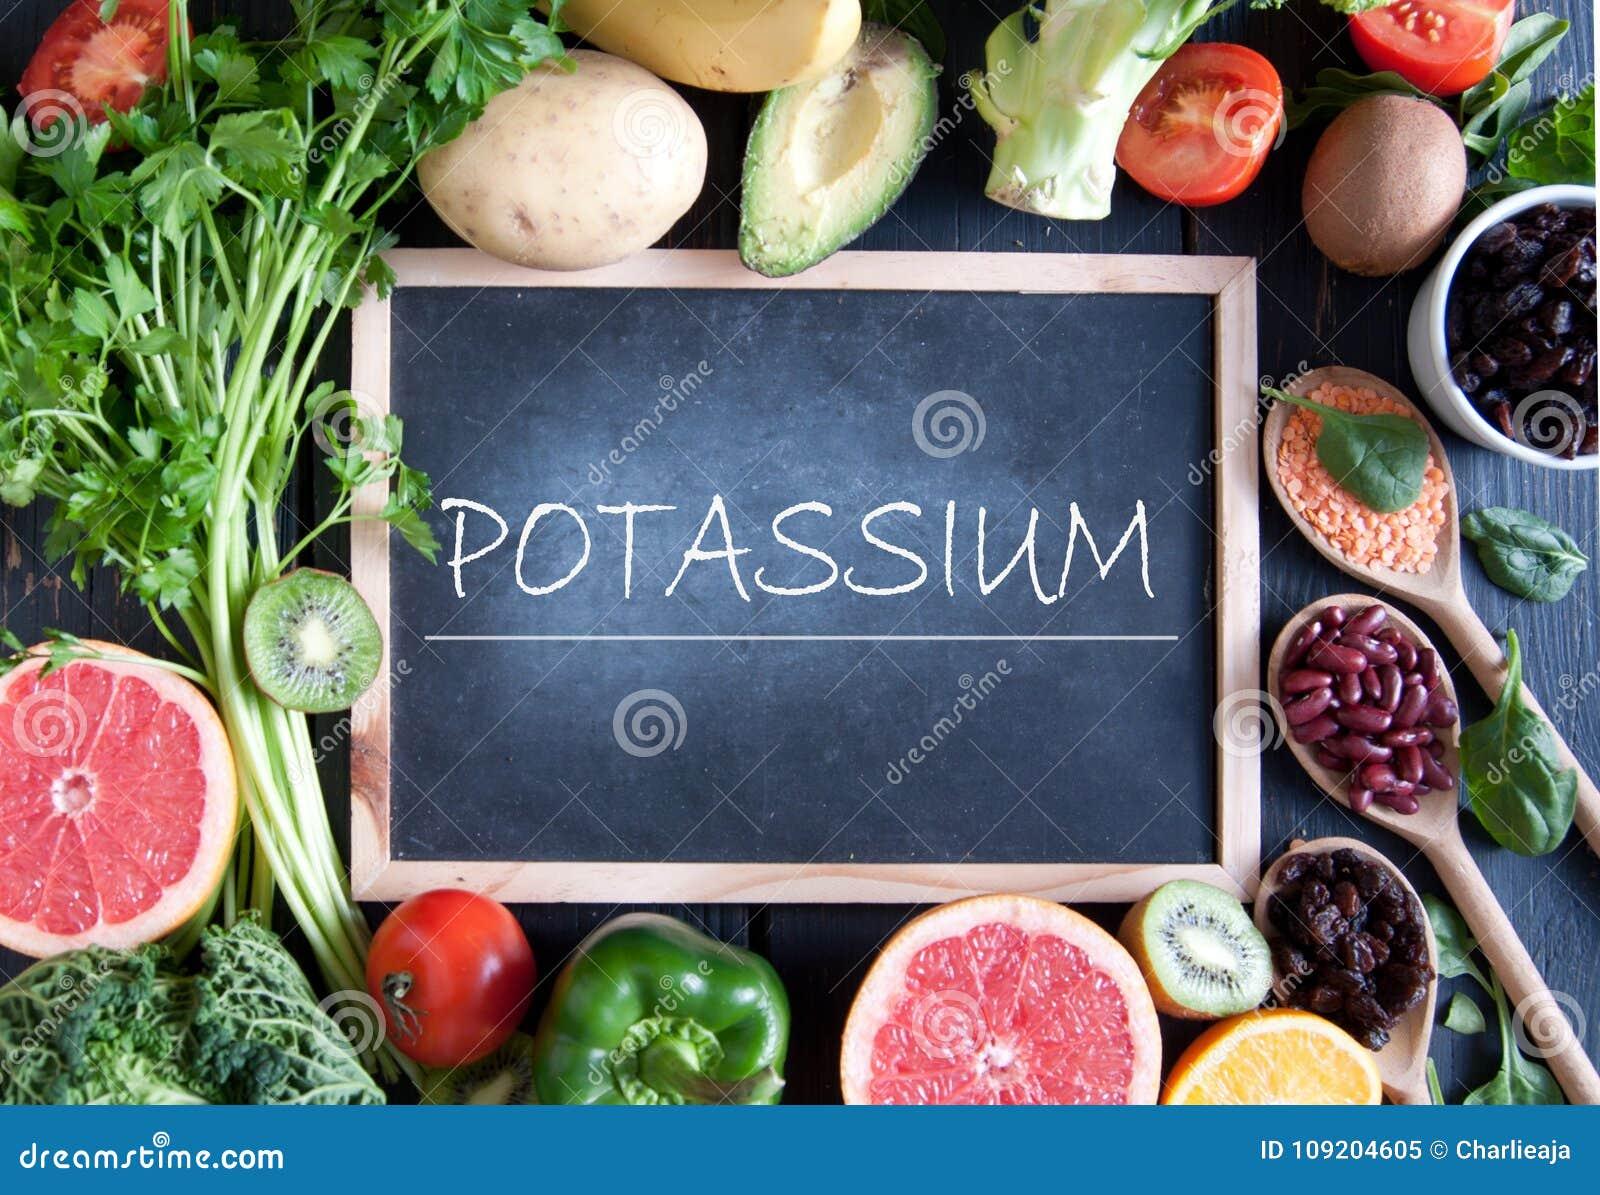 potassium rich diet foods